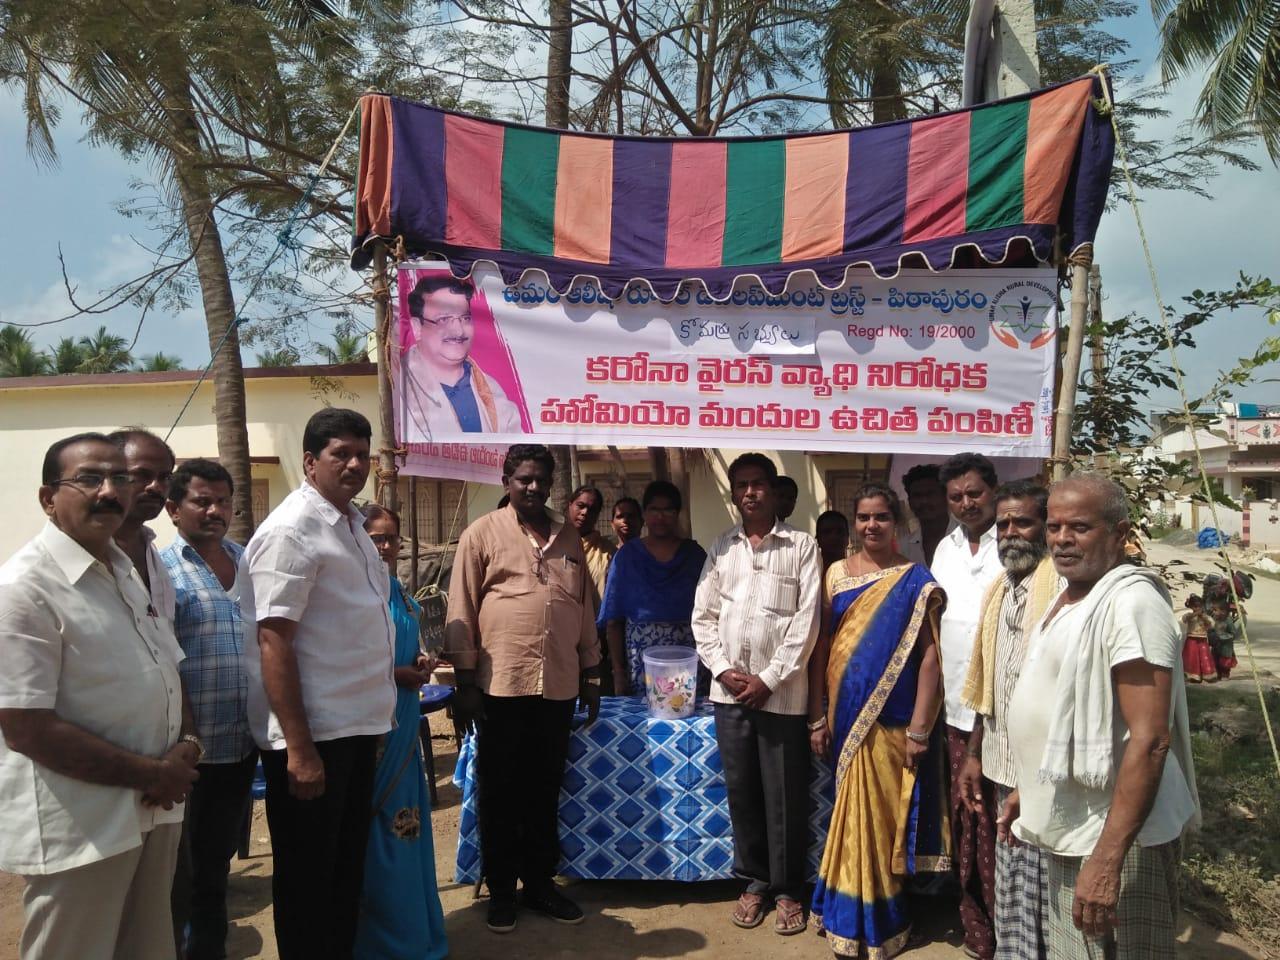 Coronavirus preventive medicine distributed by UARDT at Komarru Village on 12-March-2020